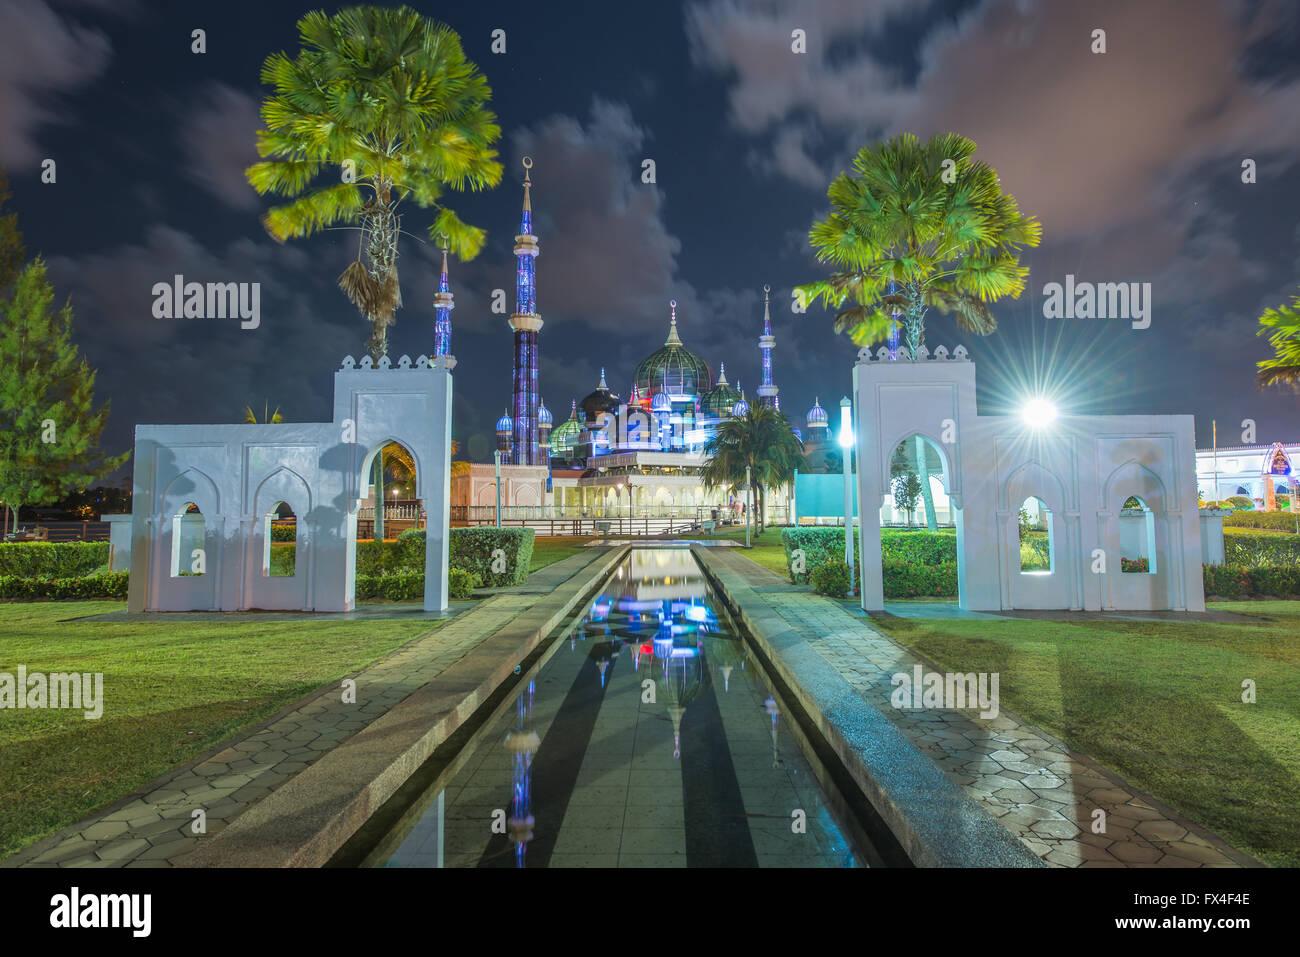 Mosquée de cristal à Kuala Lumpur, Malaisie Photo Stock